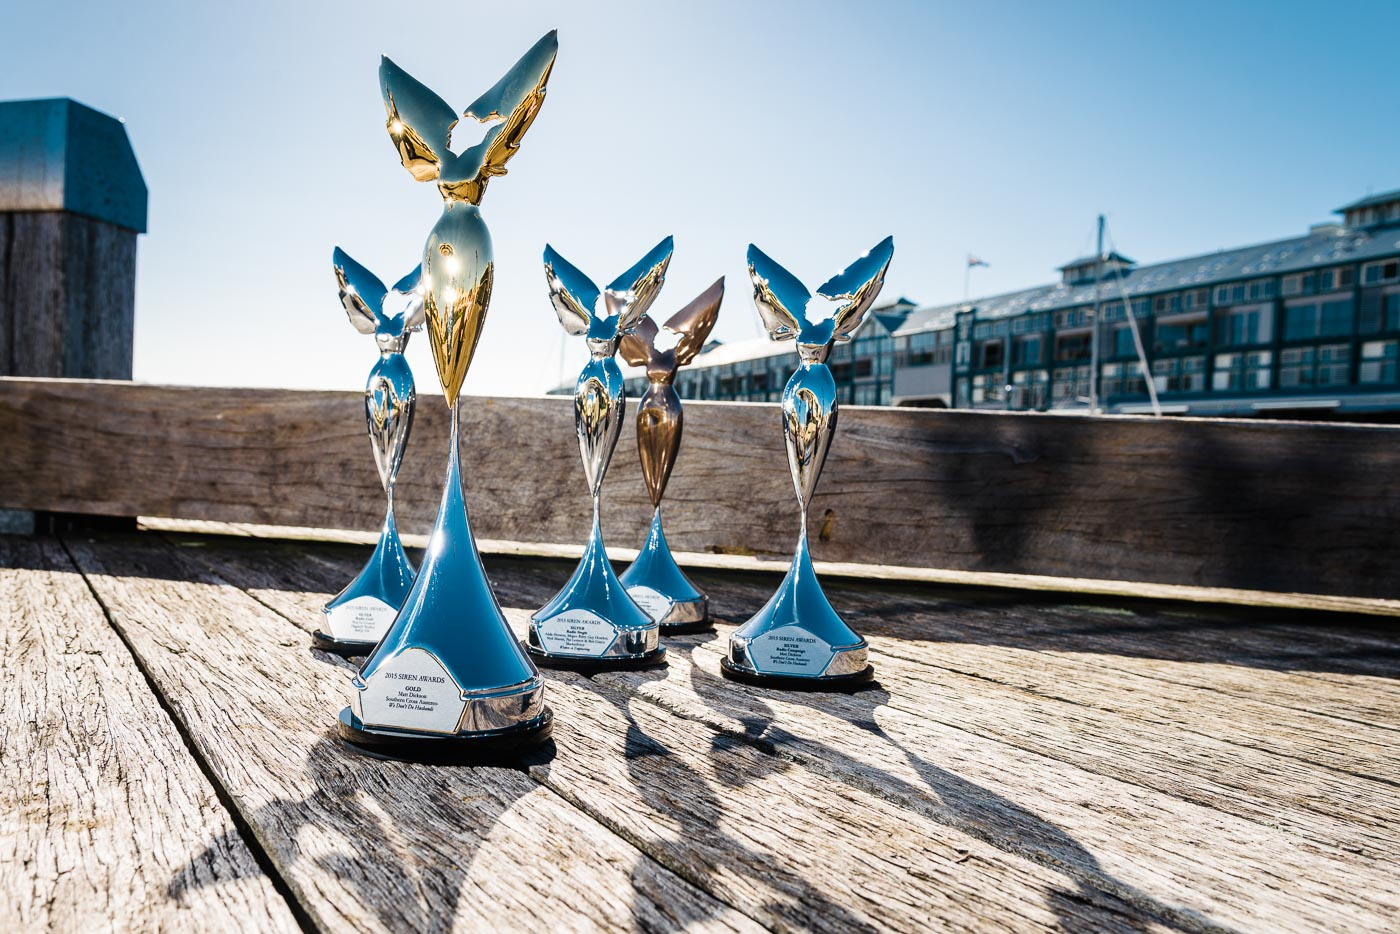 Commercial Radio Siren Awards photography